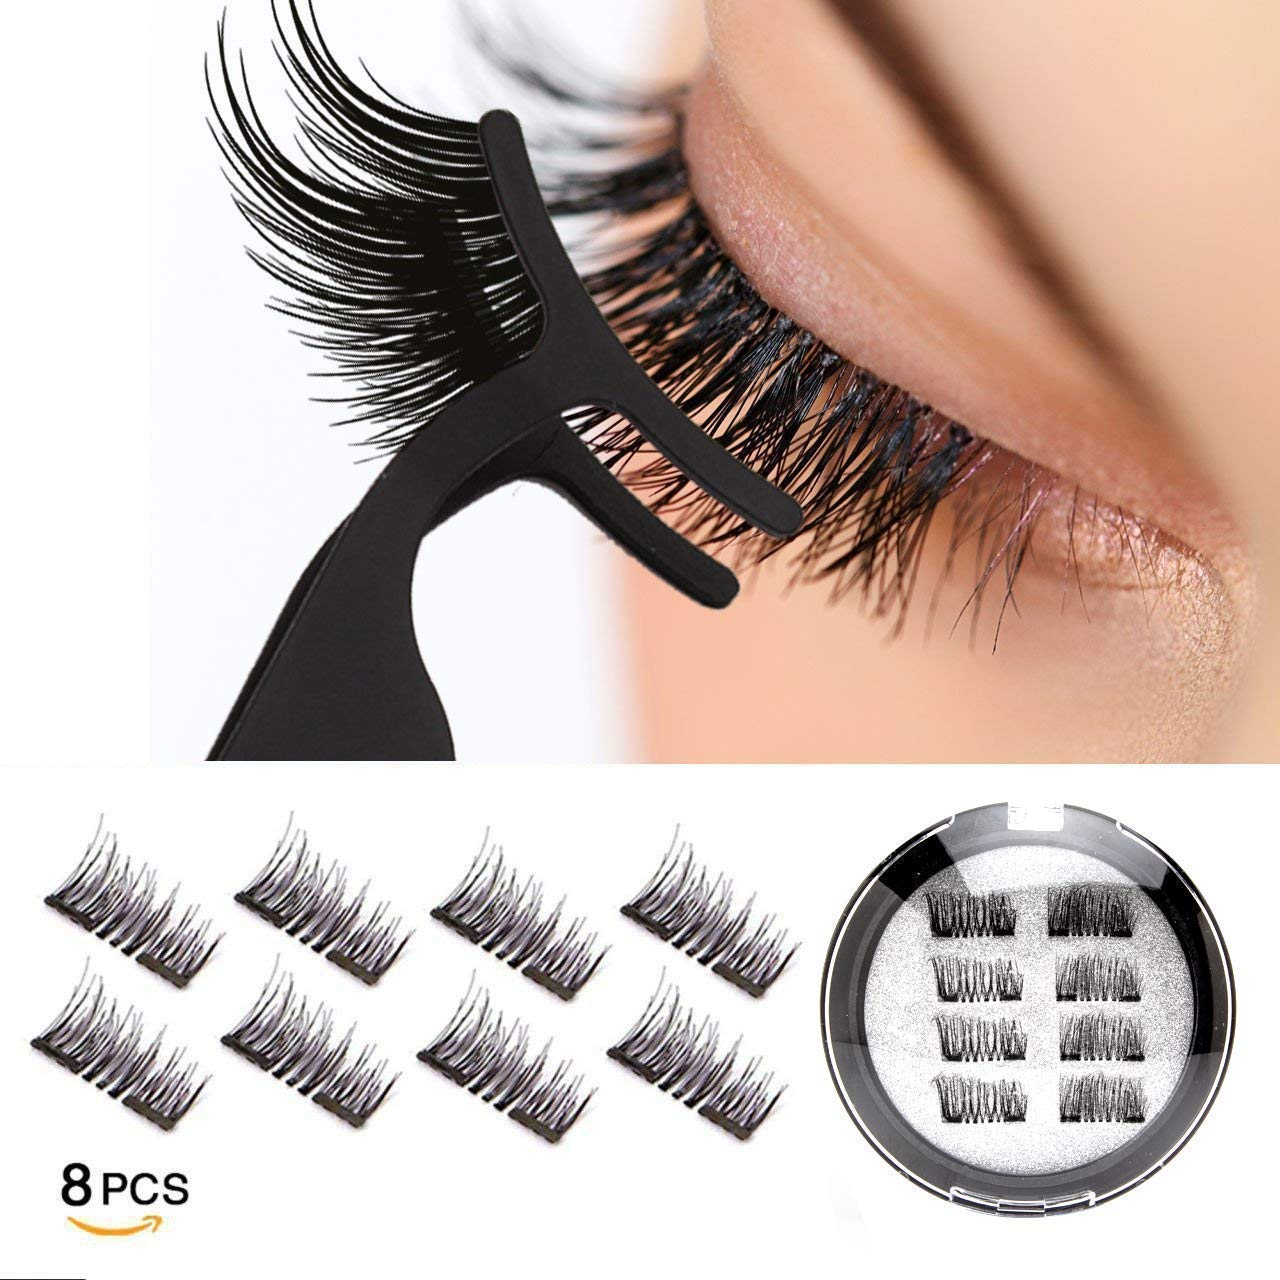 Magnetic Eyeliner and Magnetic Eyelash Kit, No Glue Reusable Silk False Lashes, 3D Magnetic Eyelashes Magnetic Lashliner for Use with Magnetic False Lashes with Applicator by VASSOUL